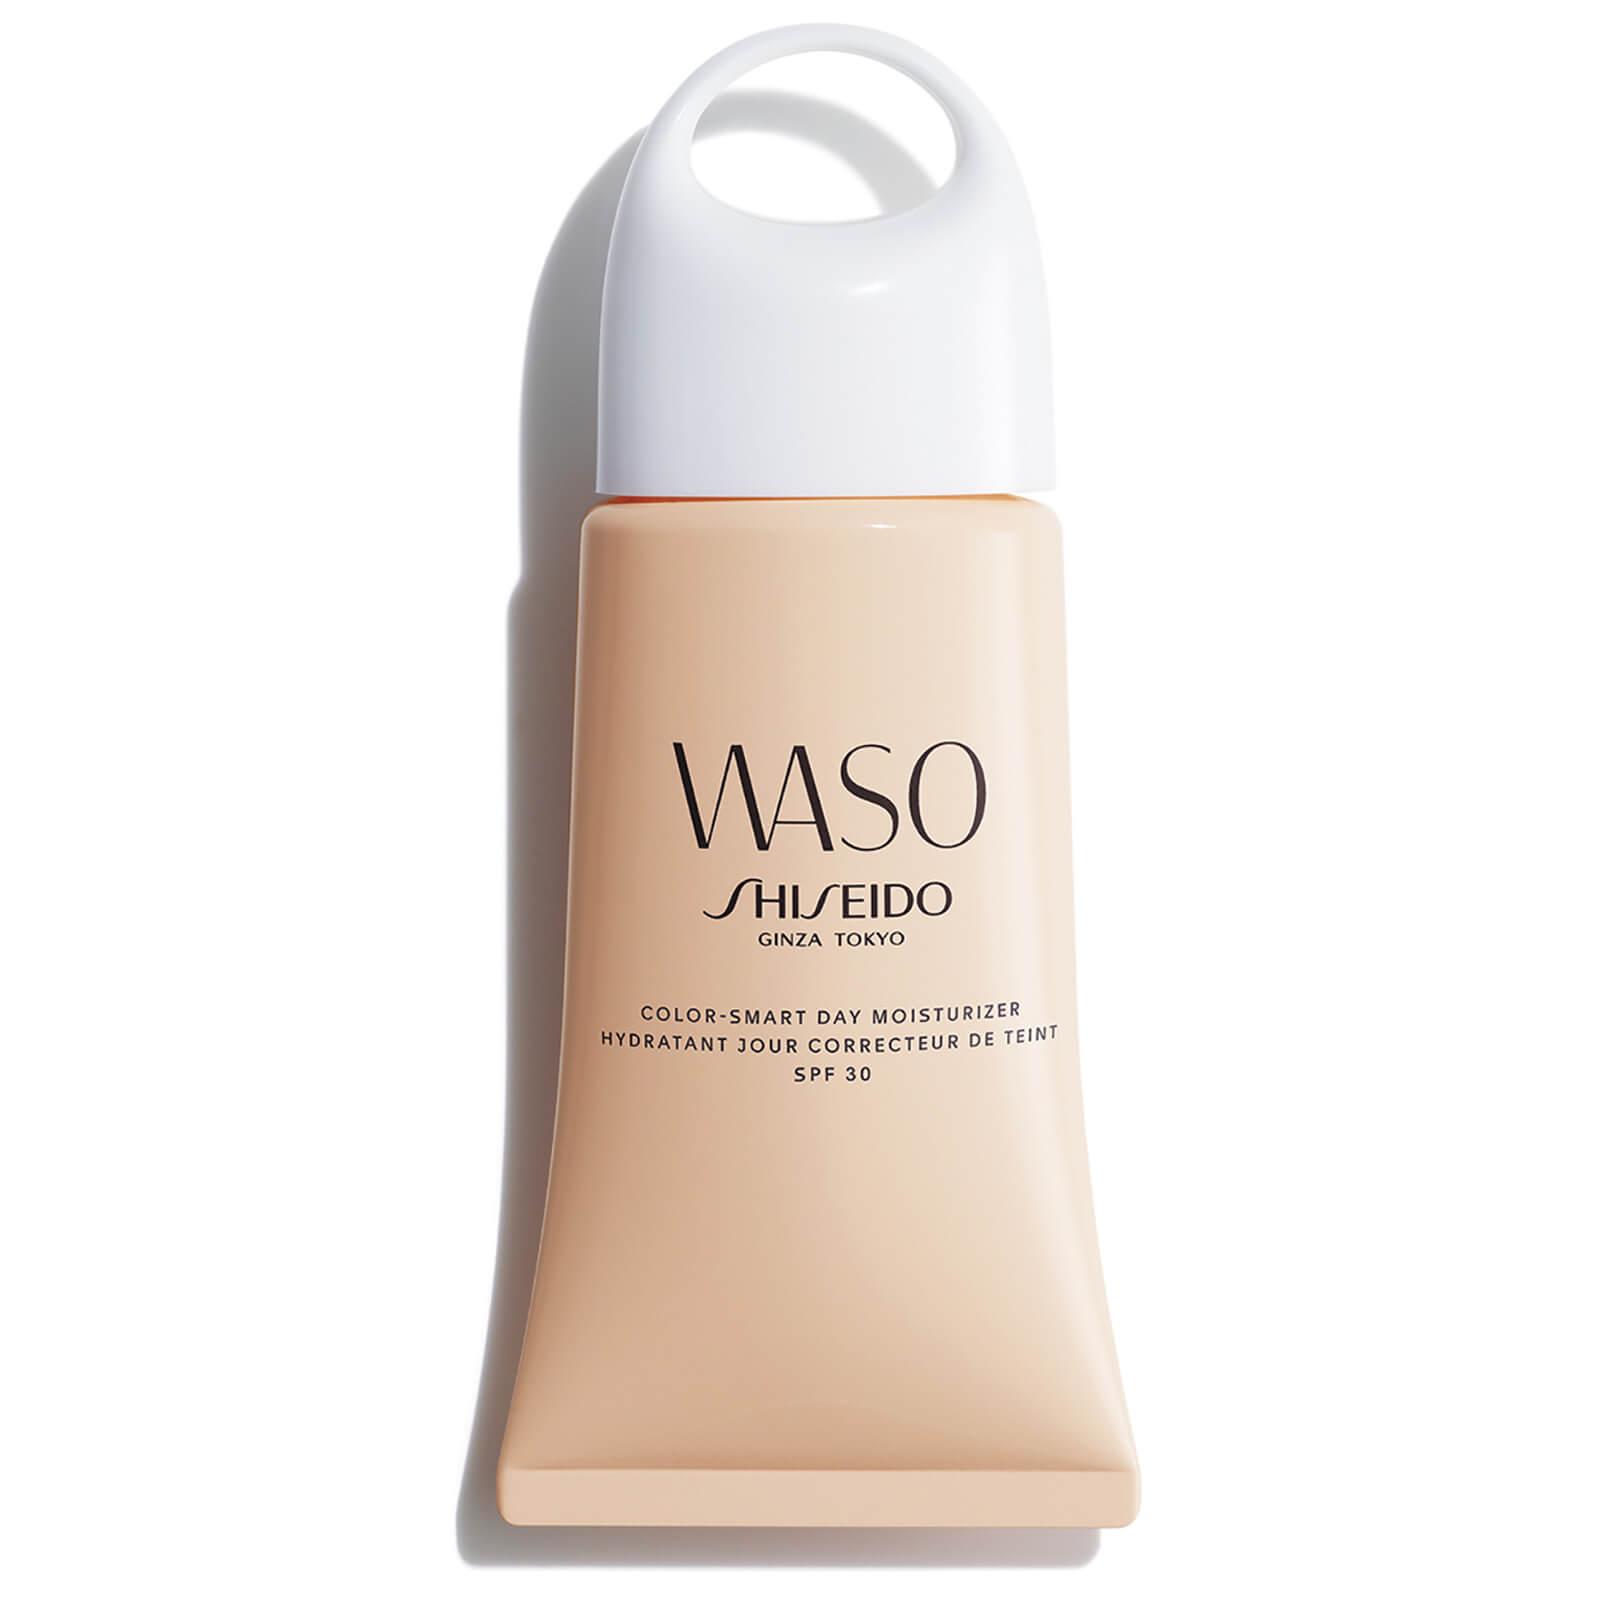 Shiseido Hydratant Jour Correcteur de Teint SPF 30 WASO Shiseido 50ml